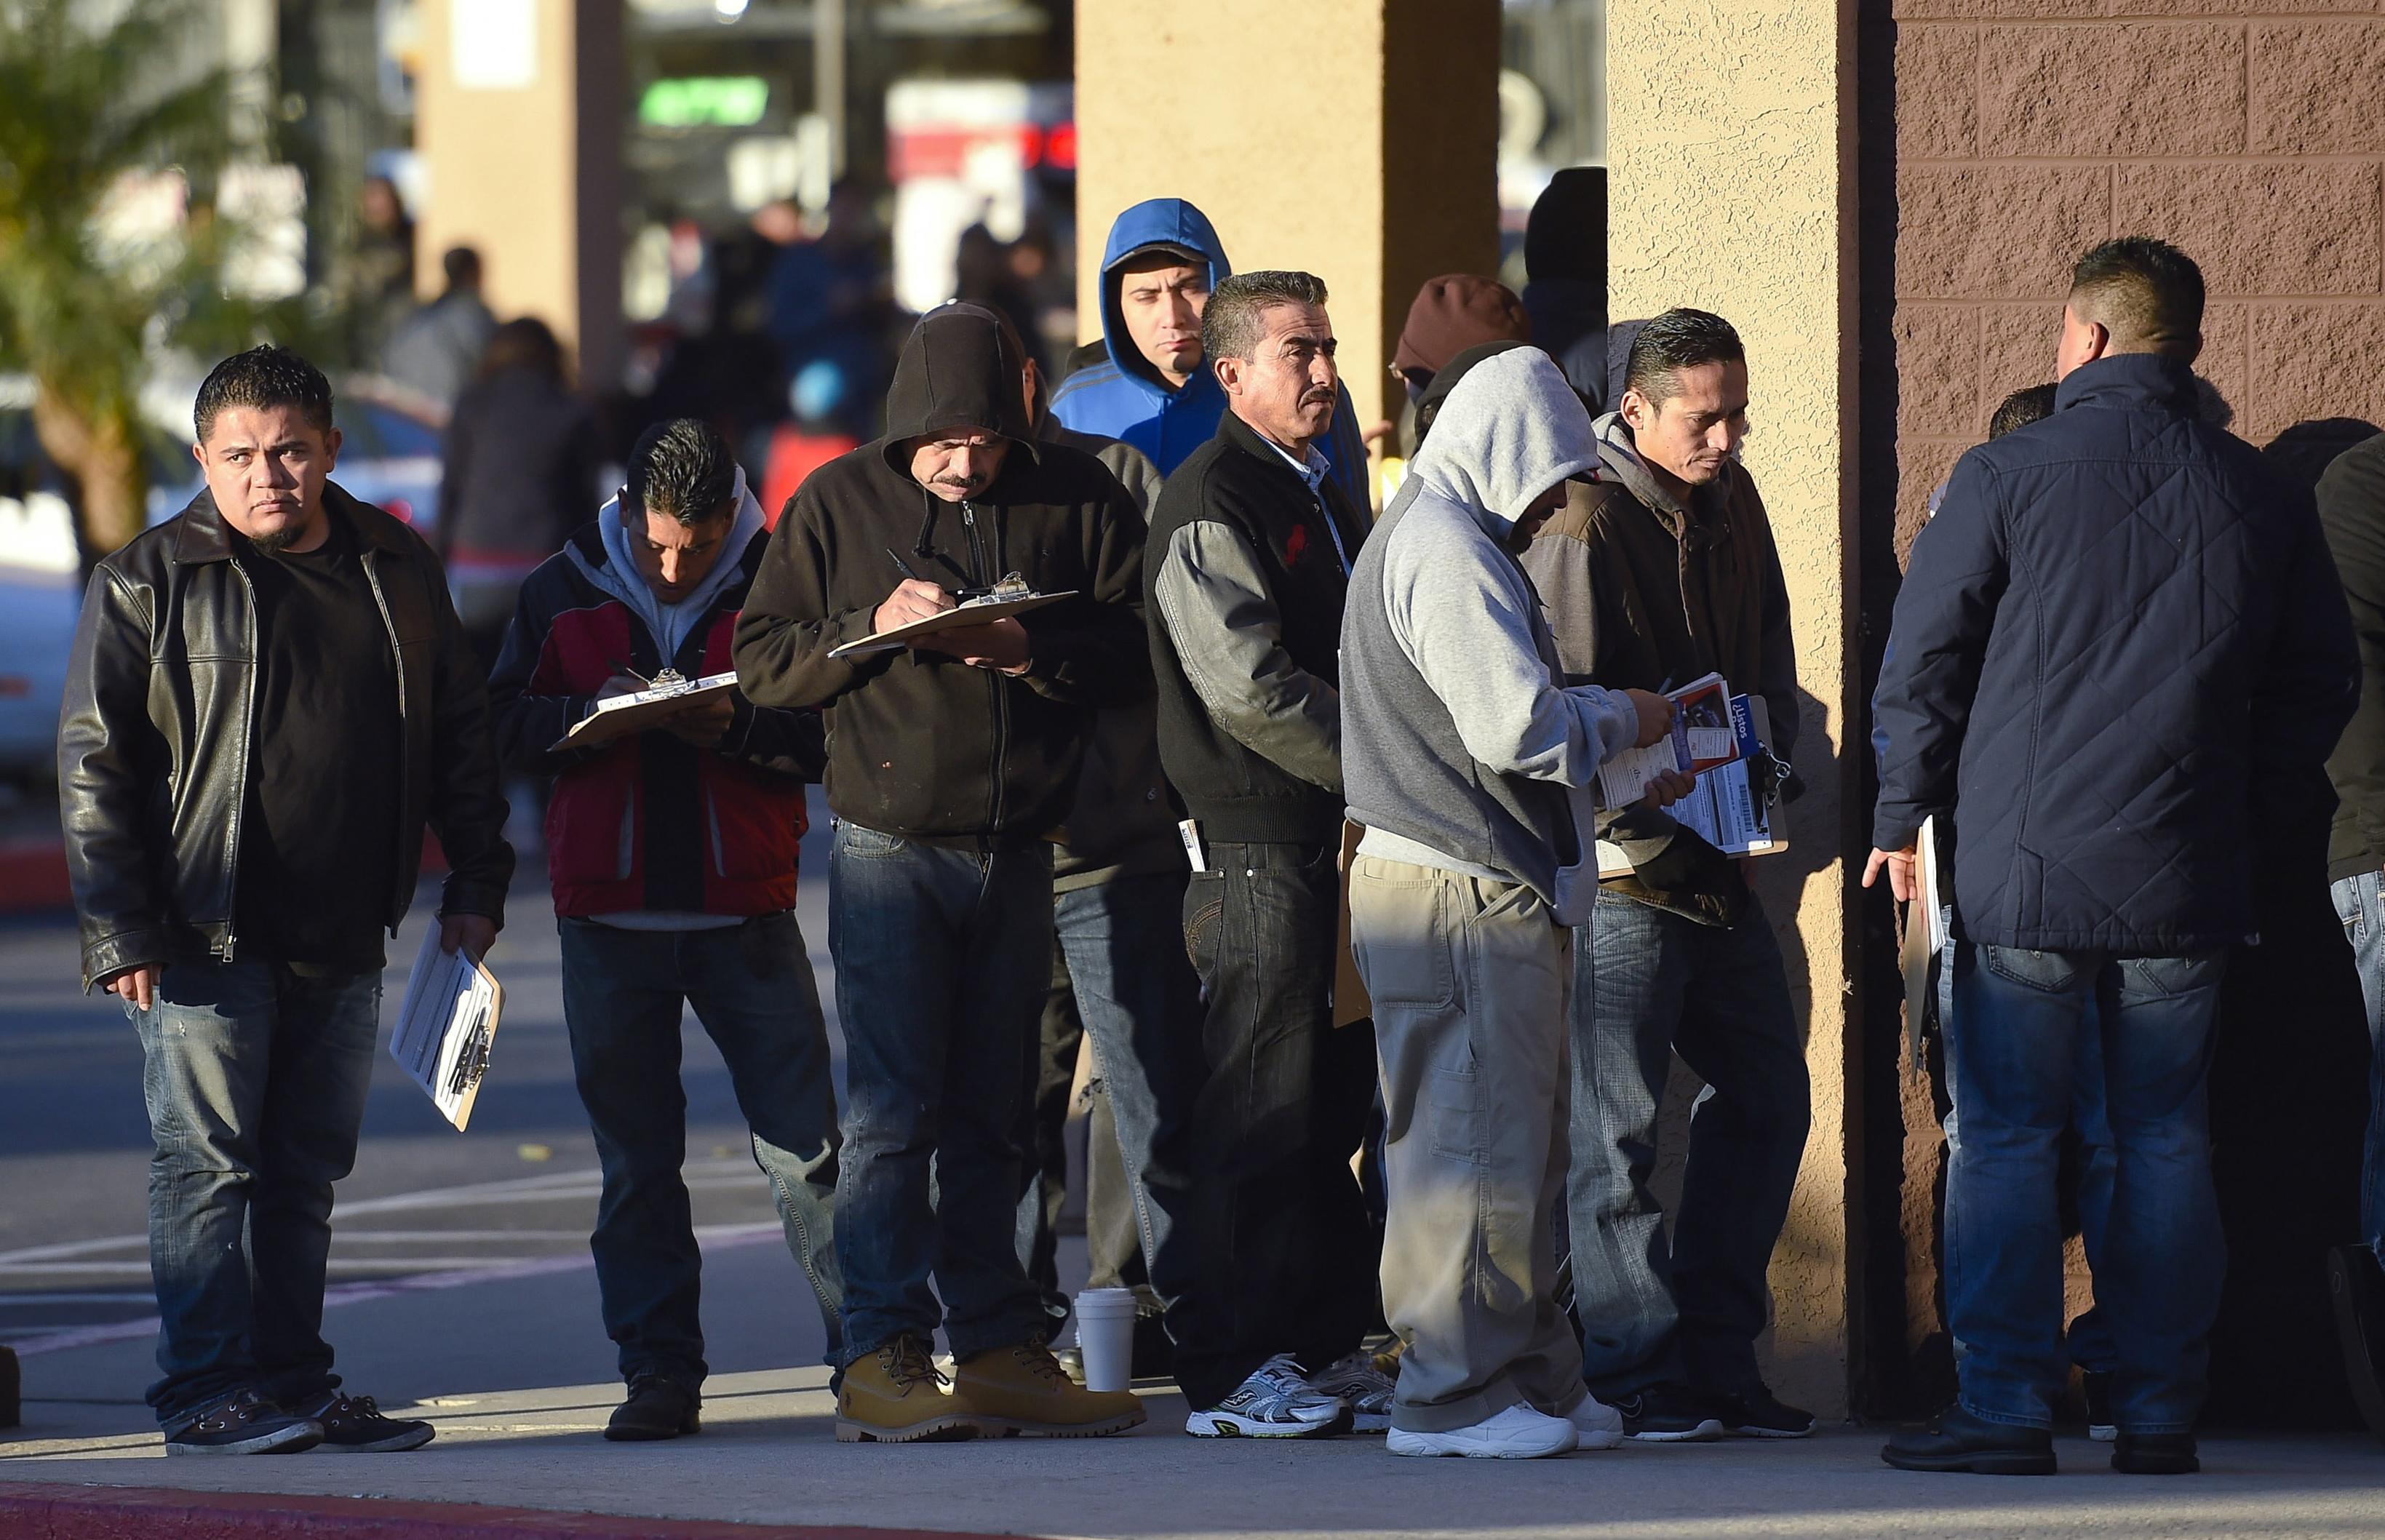 People in line at California DMV